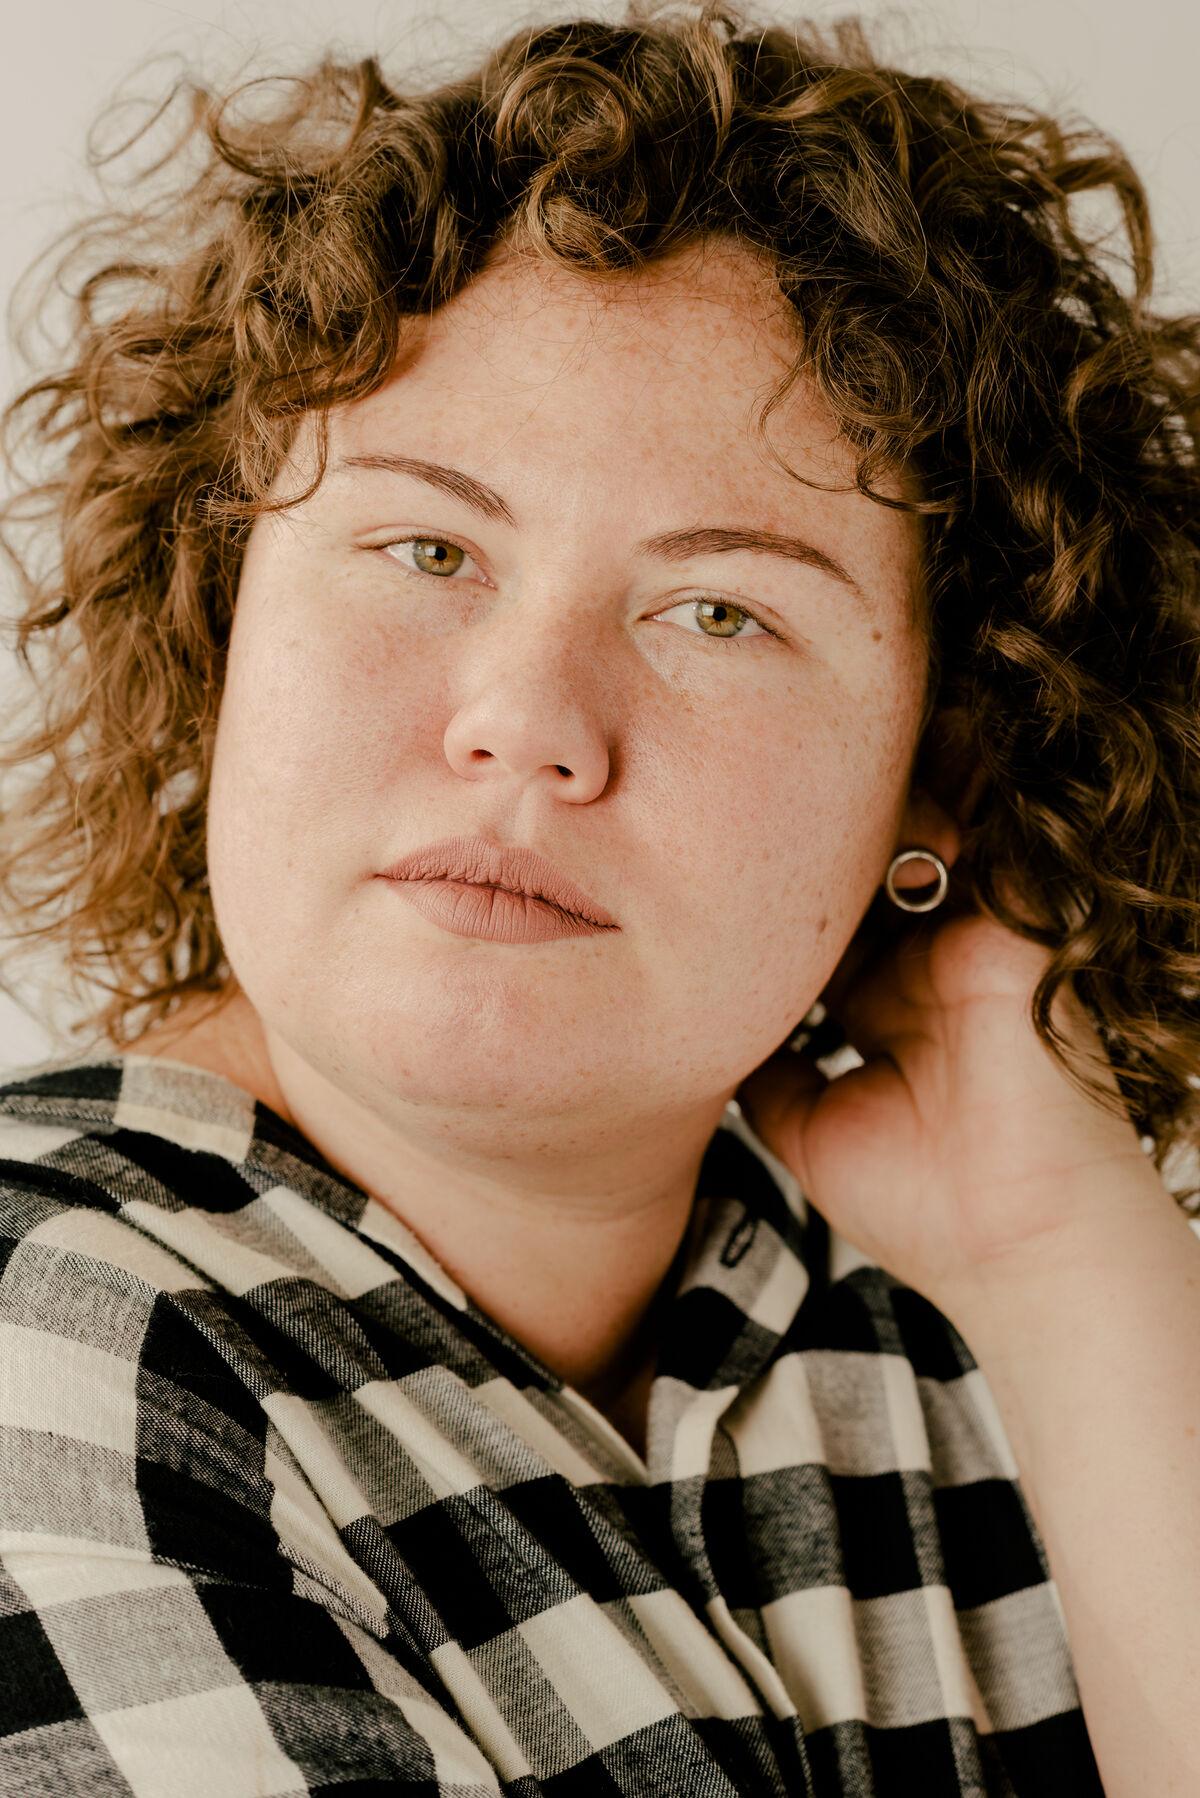 Christina Quarles by Daniel Dorsa for Artsy.